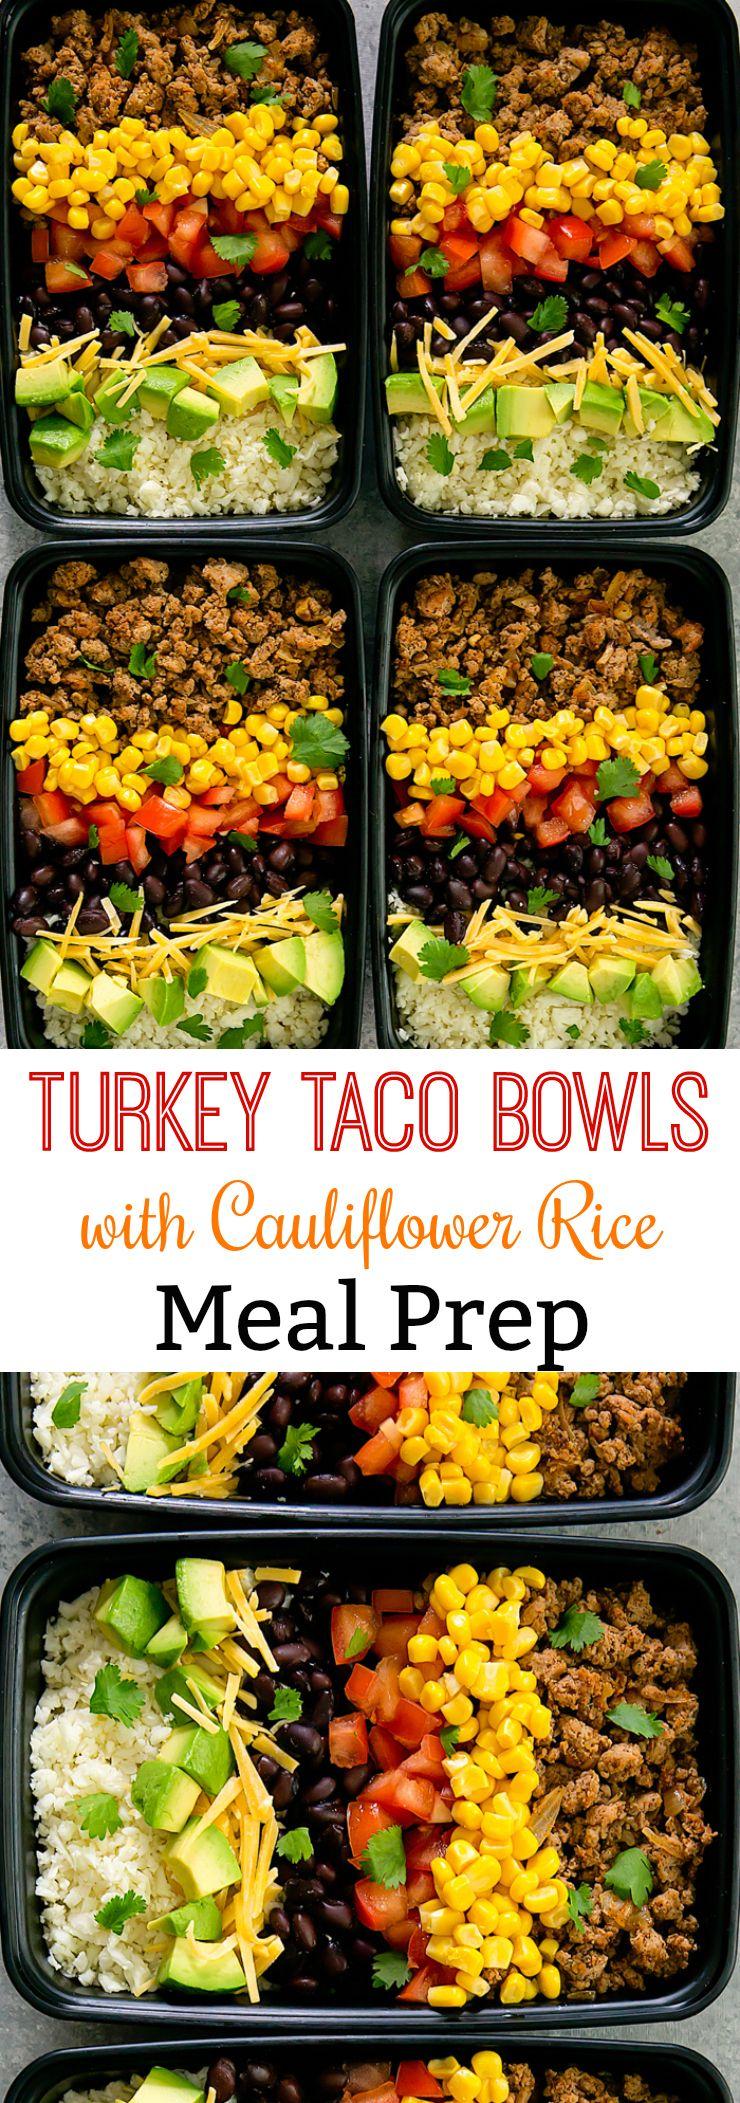 Turkey Taco Bowls With Cauliflower Rice Meal Prep Recipe Recipes